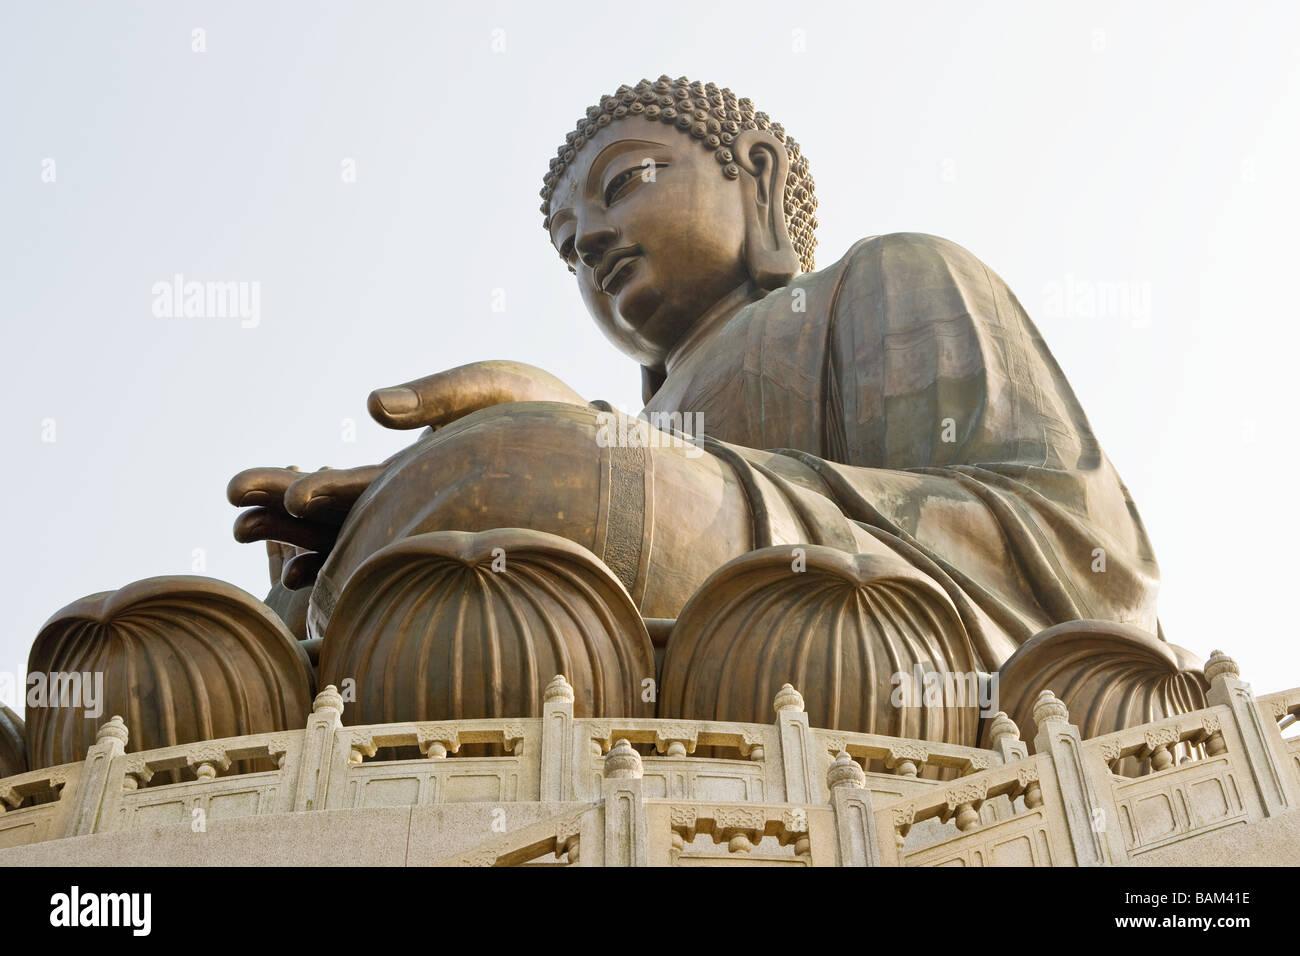 Giant buddha at po lin monastery - Stock Image